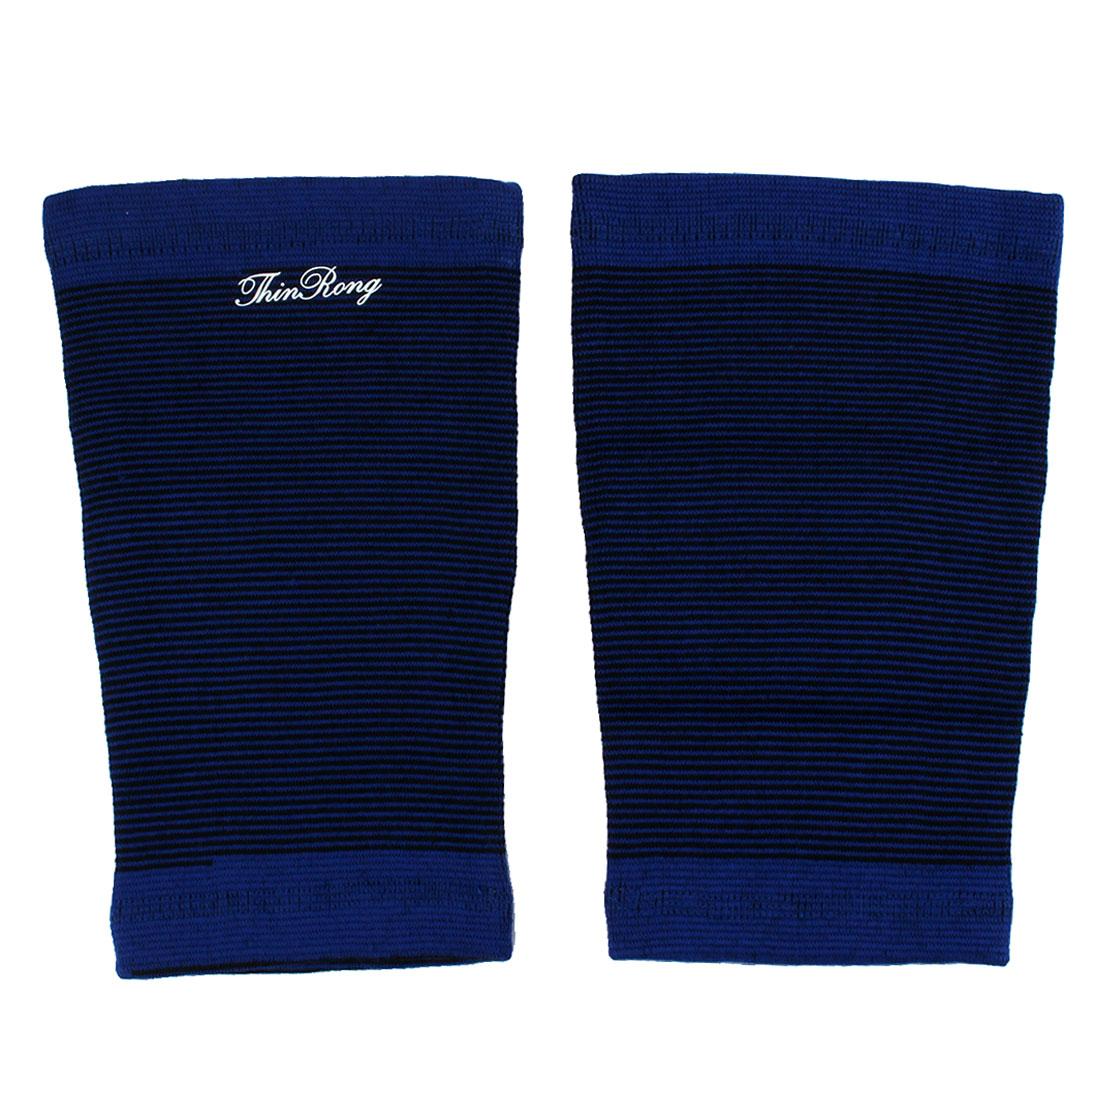 Black Blue Strip Elastic Thigh Support Sport Bandage x 2PCS